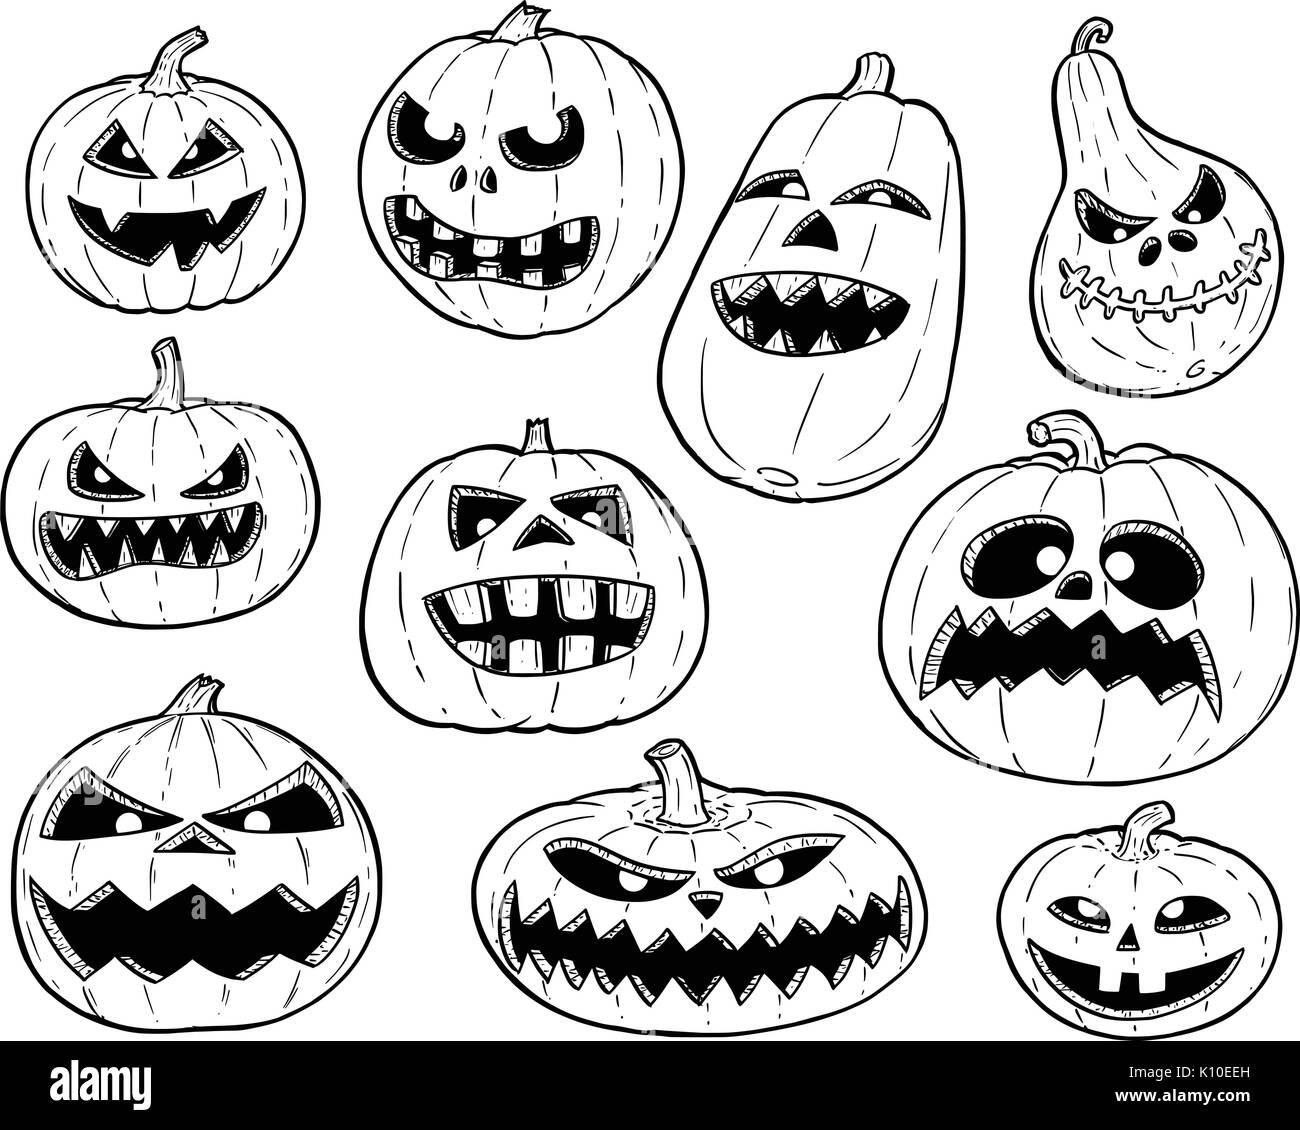 set of cute hand drawing illustration of halloween pumpkin designs